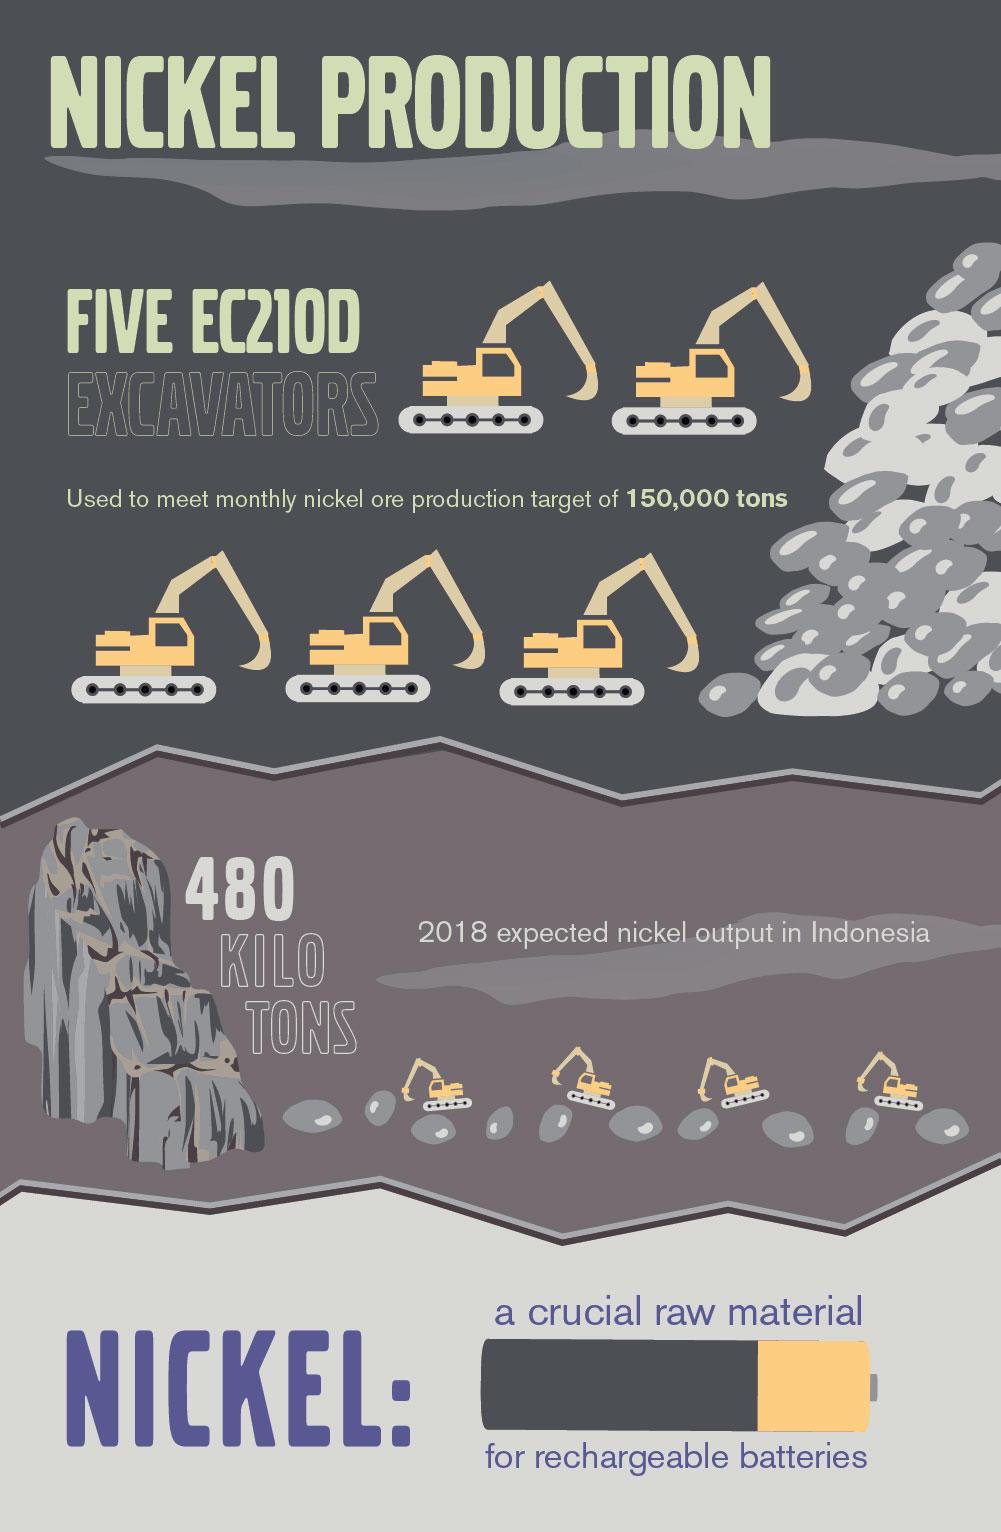 EC210 Nickel